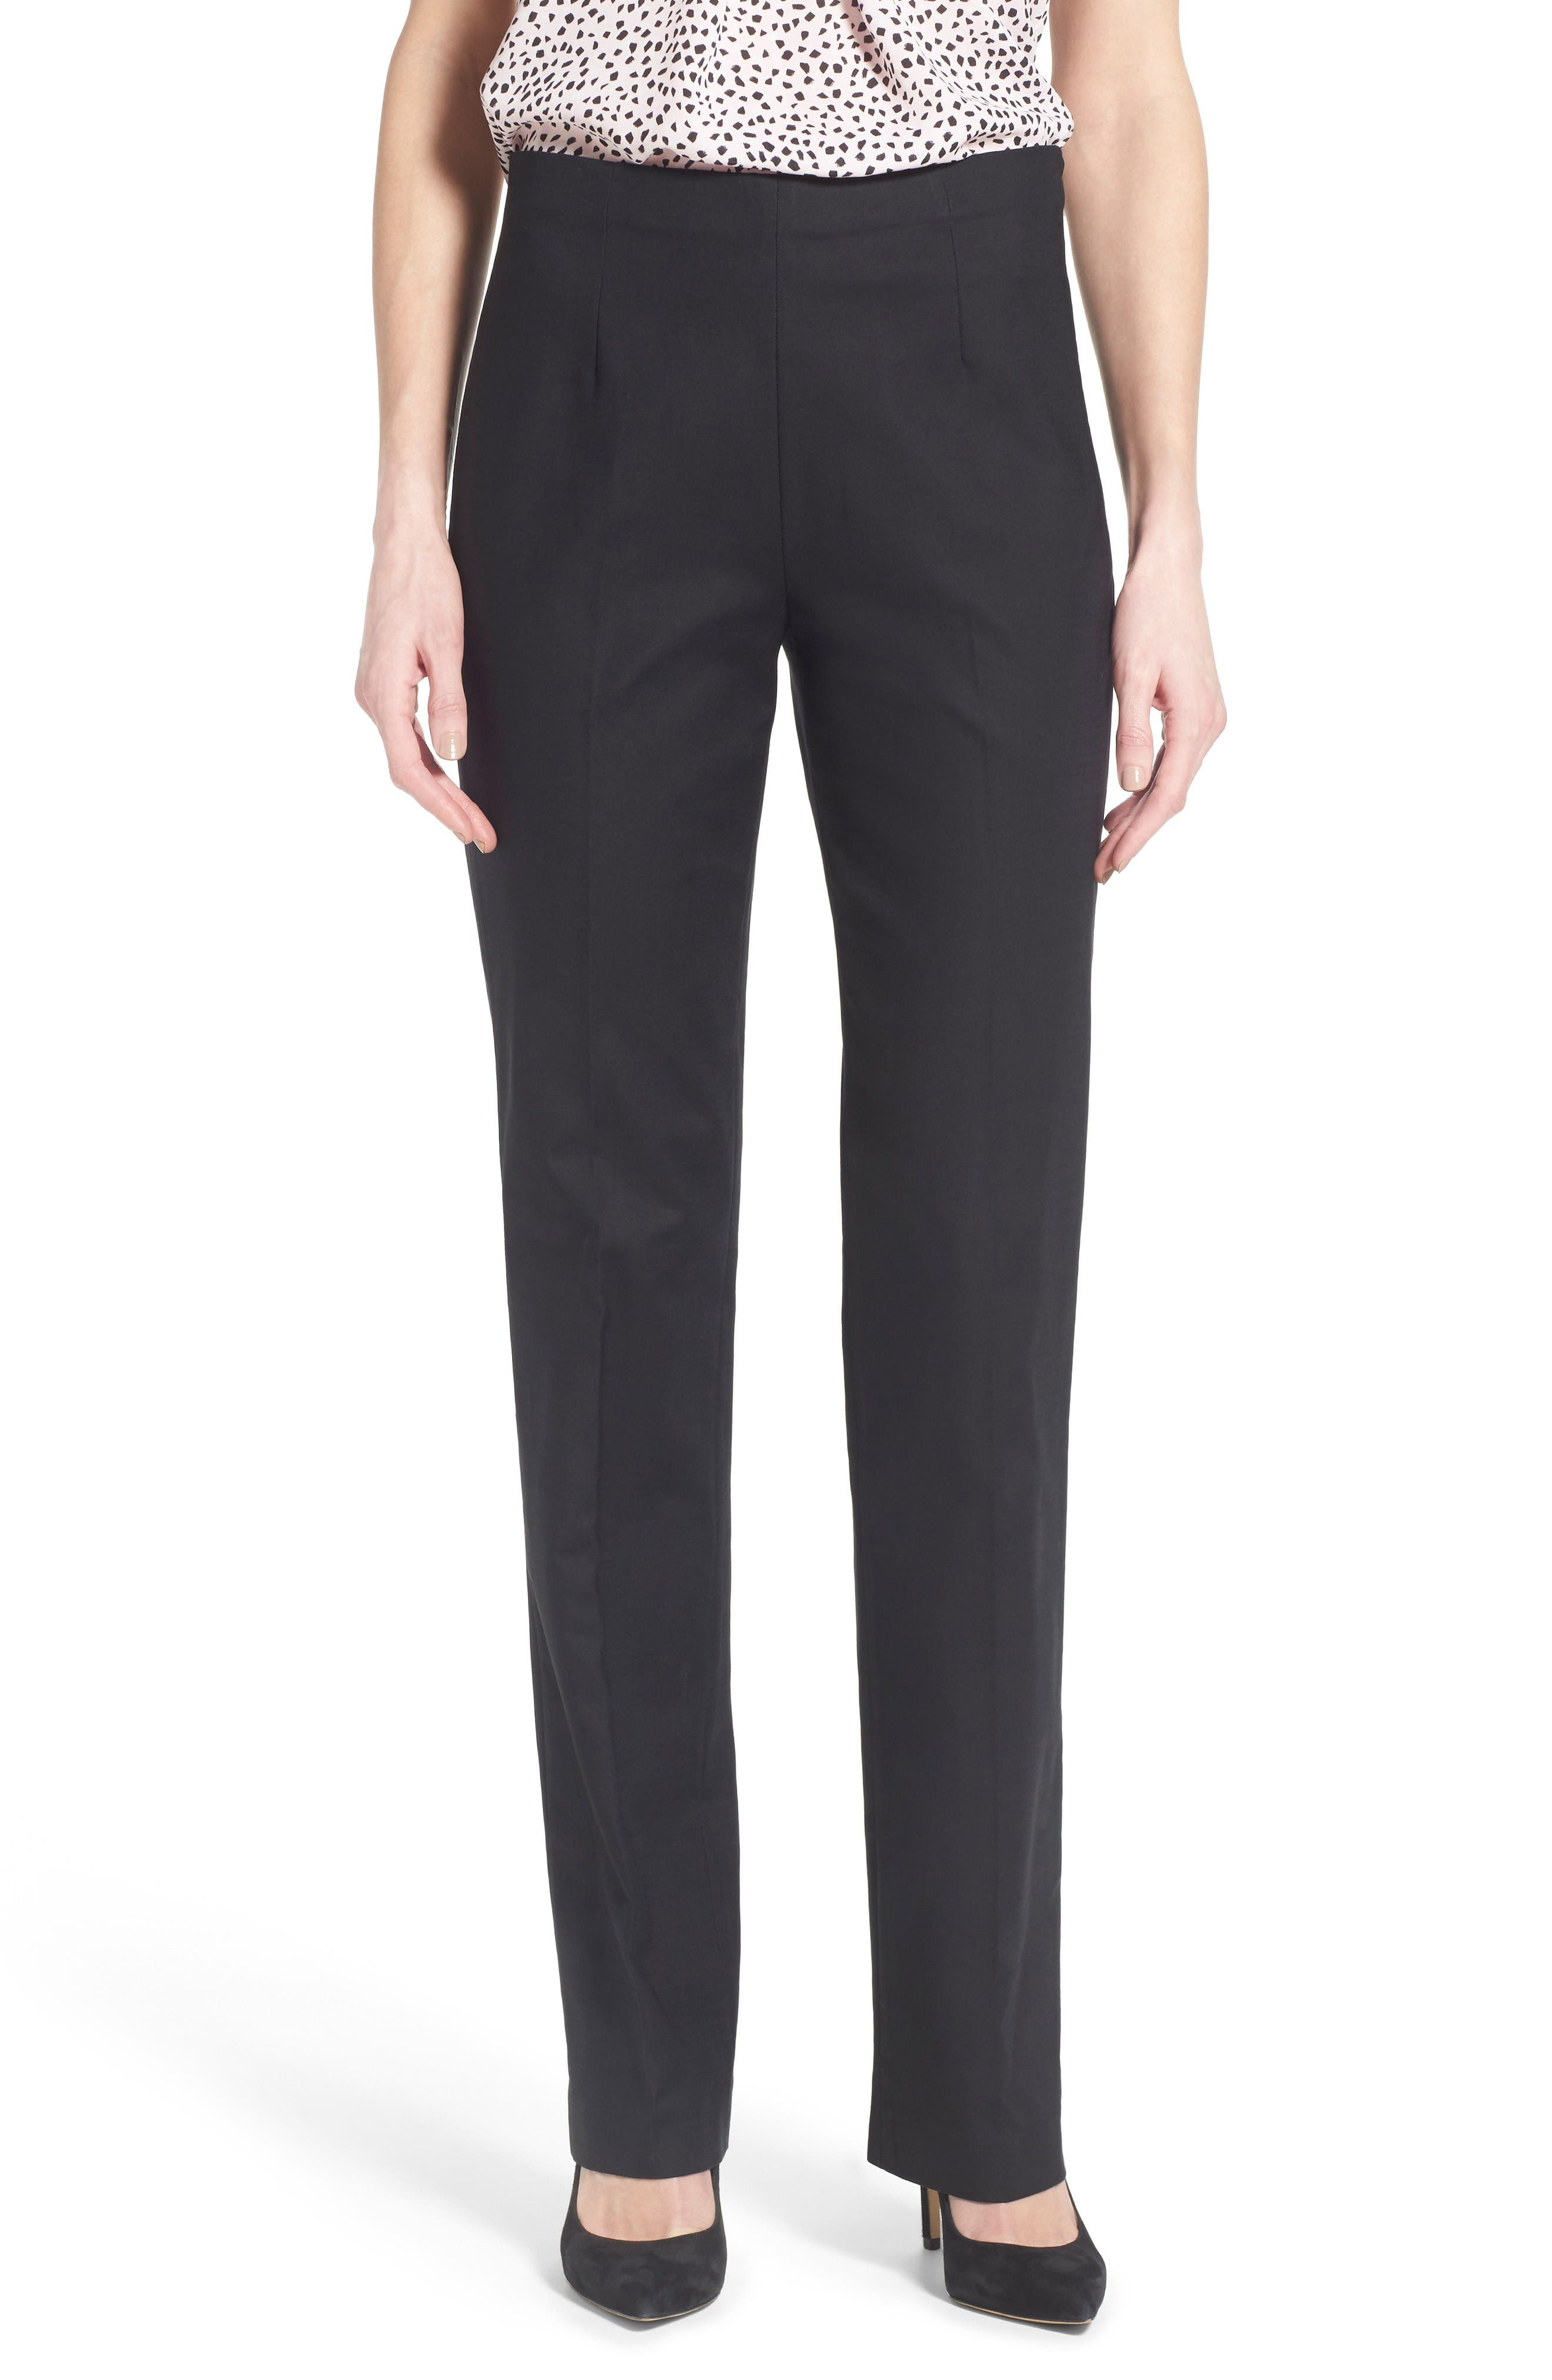 Size 2 black dress pants rolled